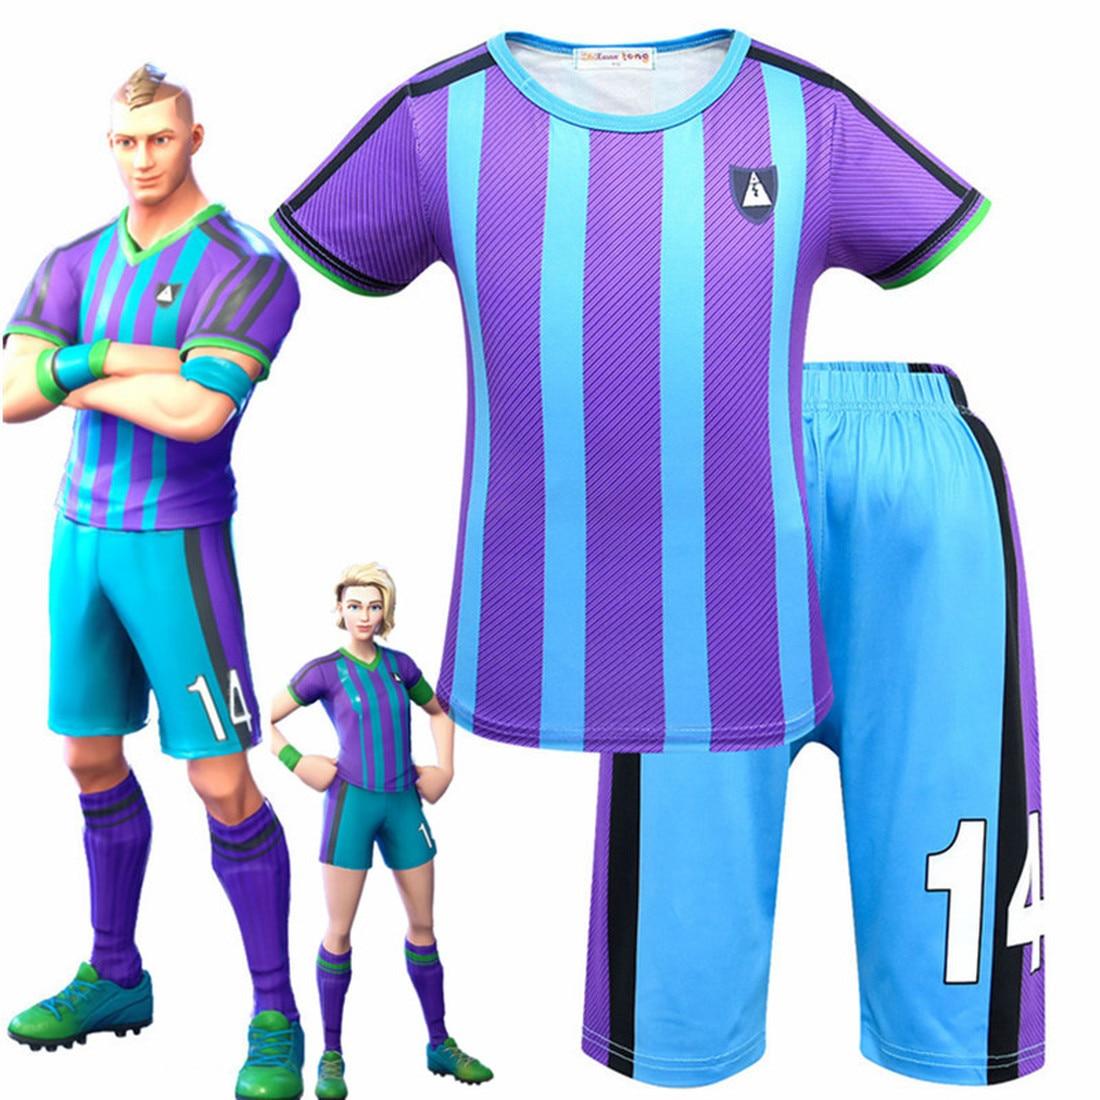 Fortnited enfant enfants menace aérienne garçons personnage bleu Football Cosplay vêtements carnaval Costumes Ninja fête drôle vêtements